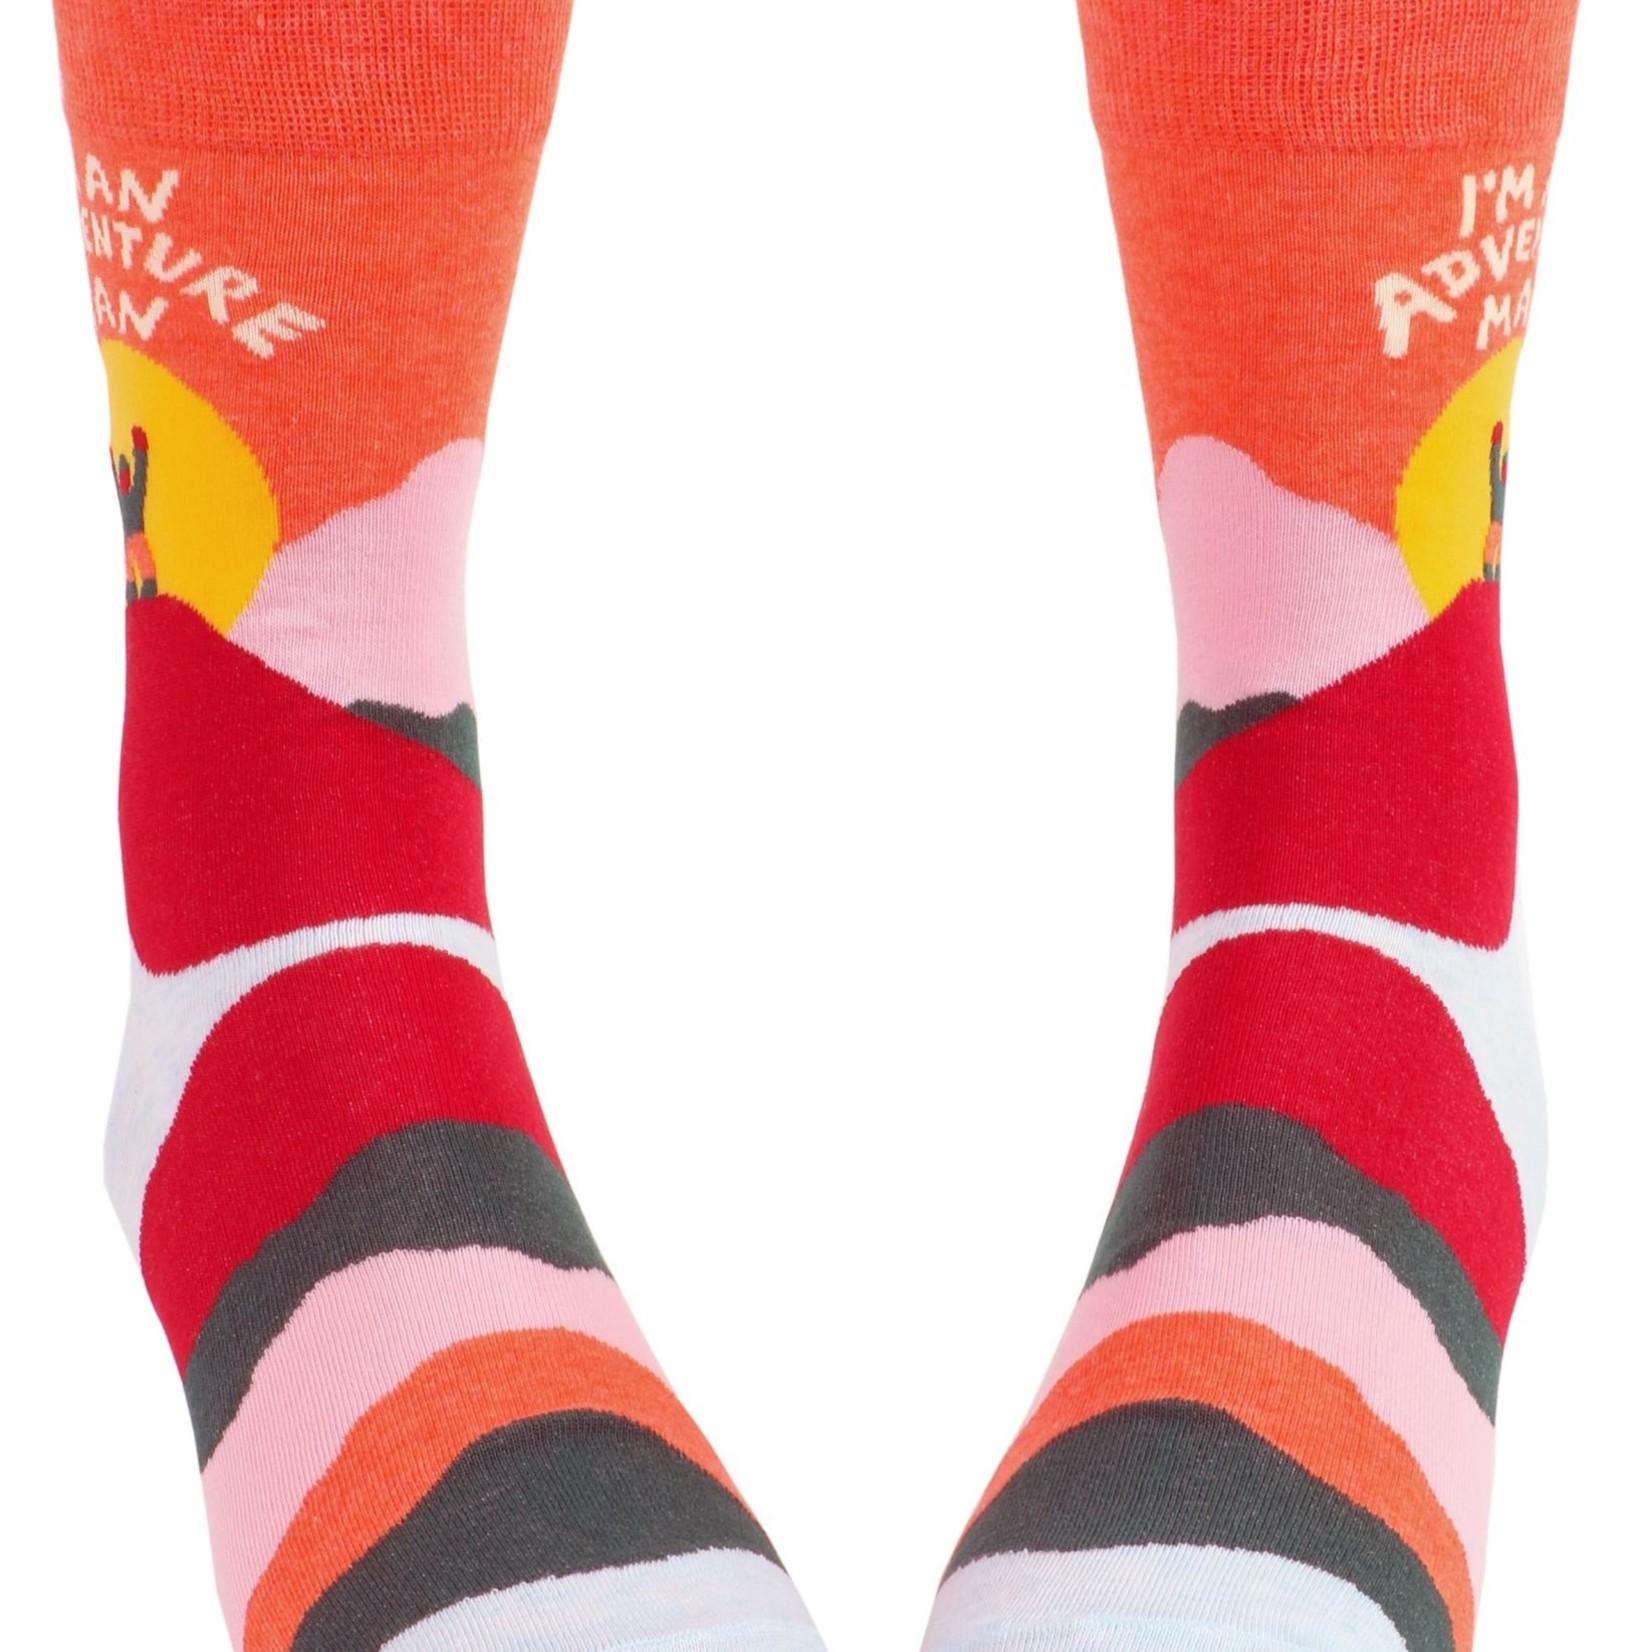 Adventure Man Men's Crew Socks